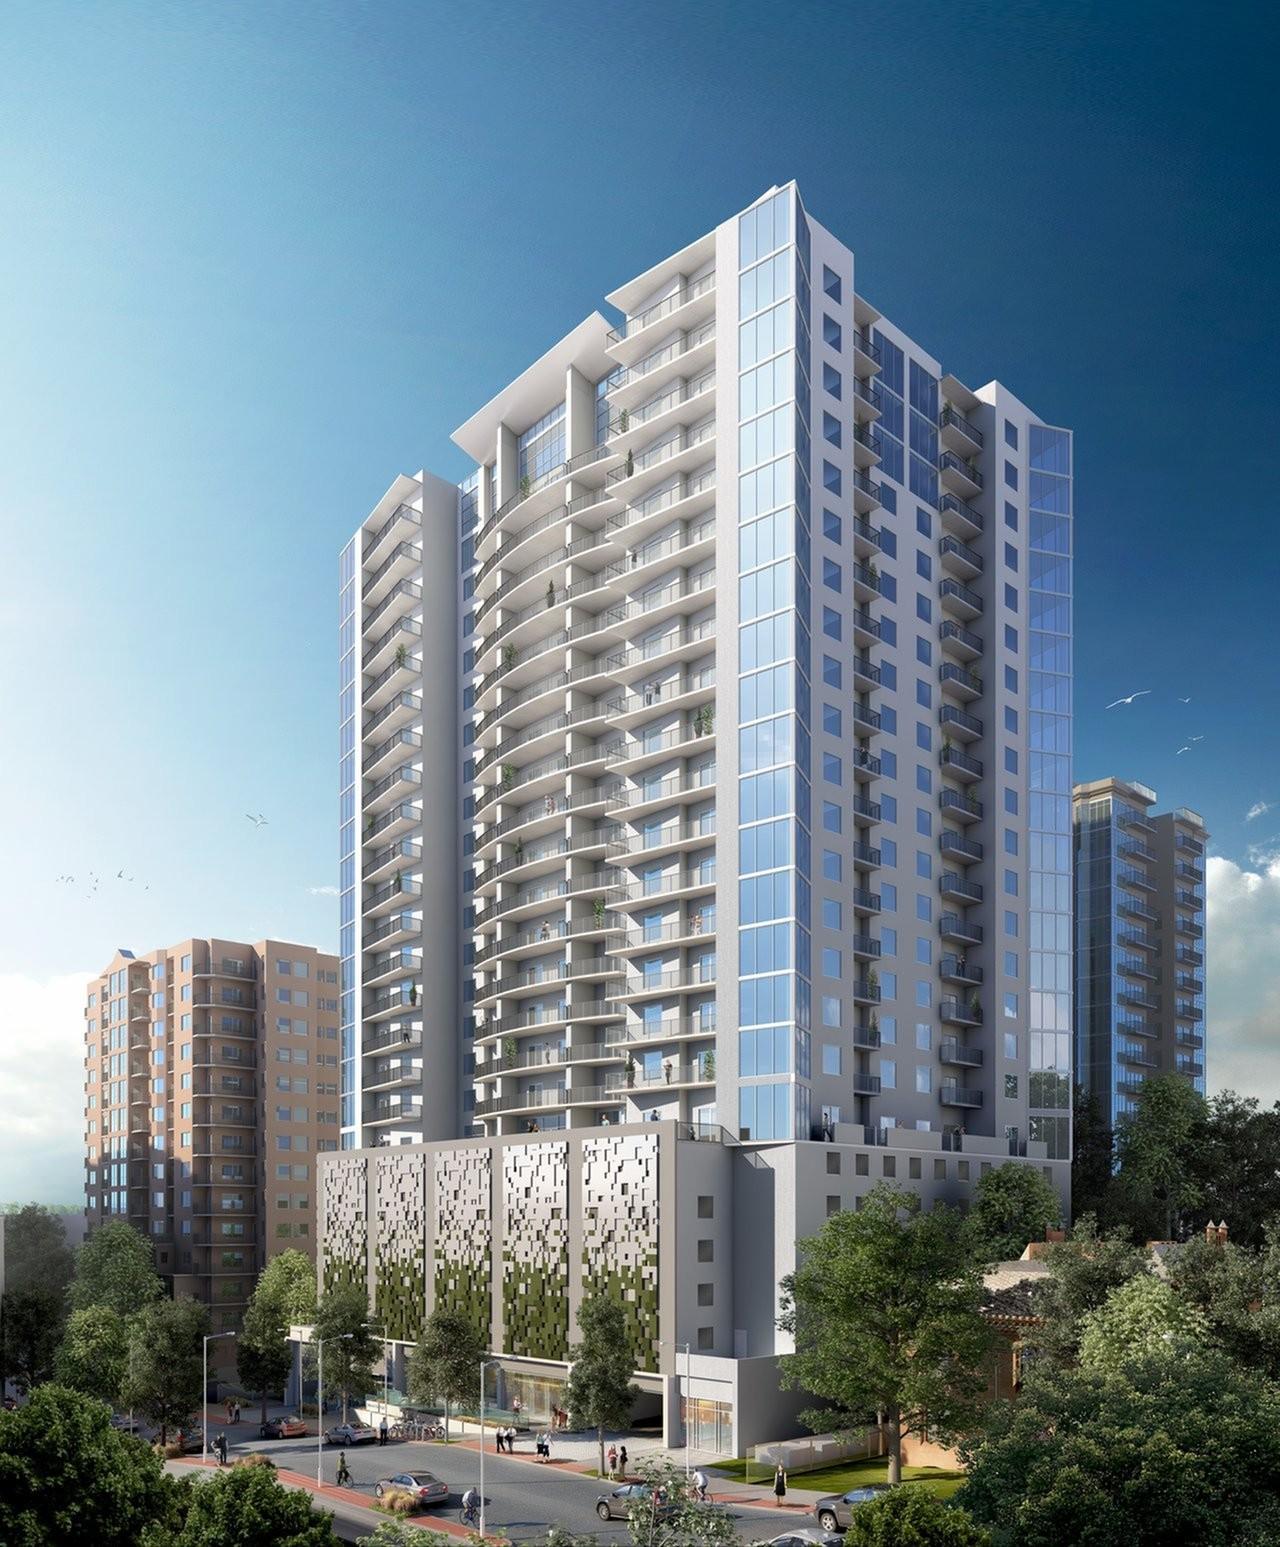 Atlanta Apartments For Rent: 855 West Peachtree St NW, Atlanta